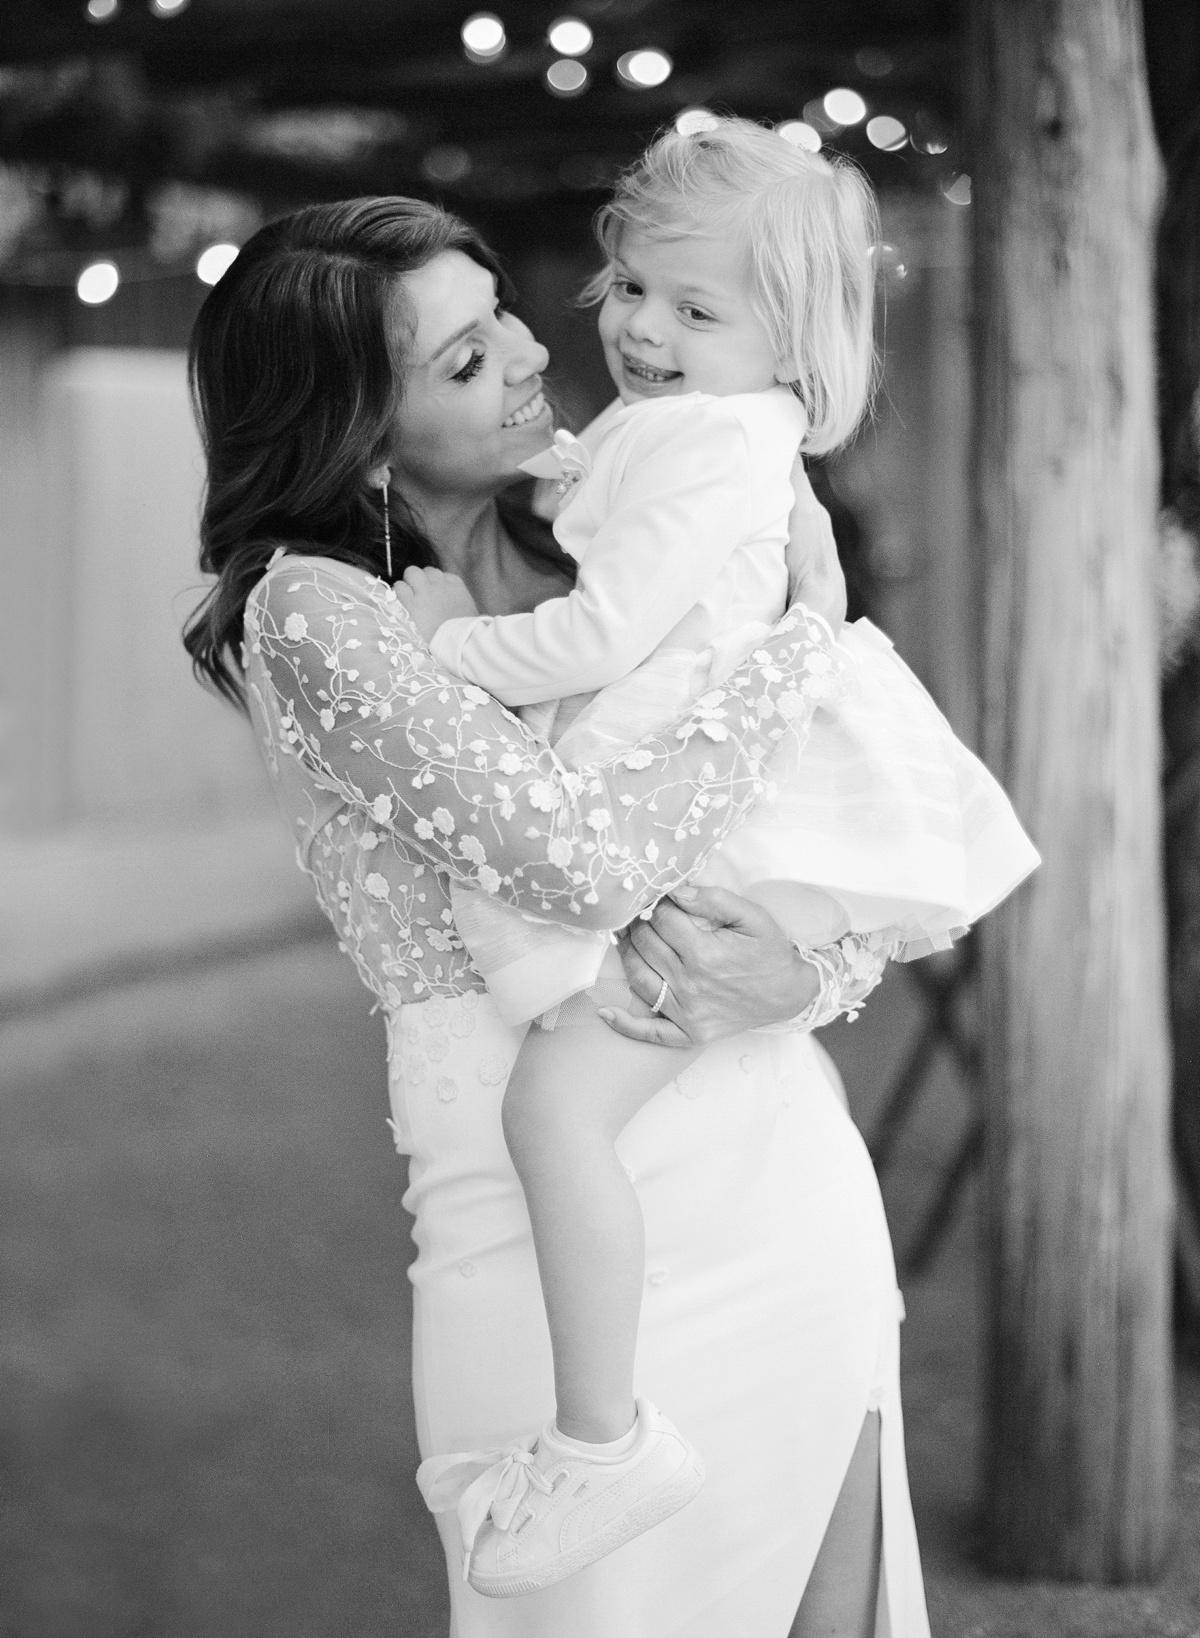 Wedding Archives - Lacie Hansen Photography | Santa Barbara Wedding ...